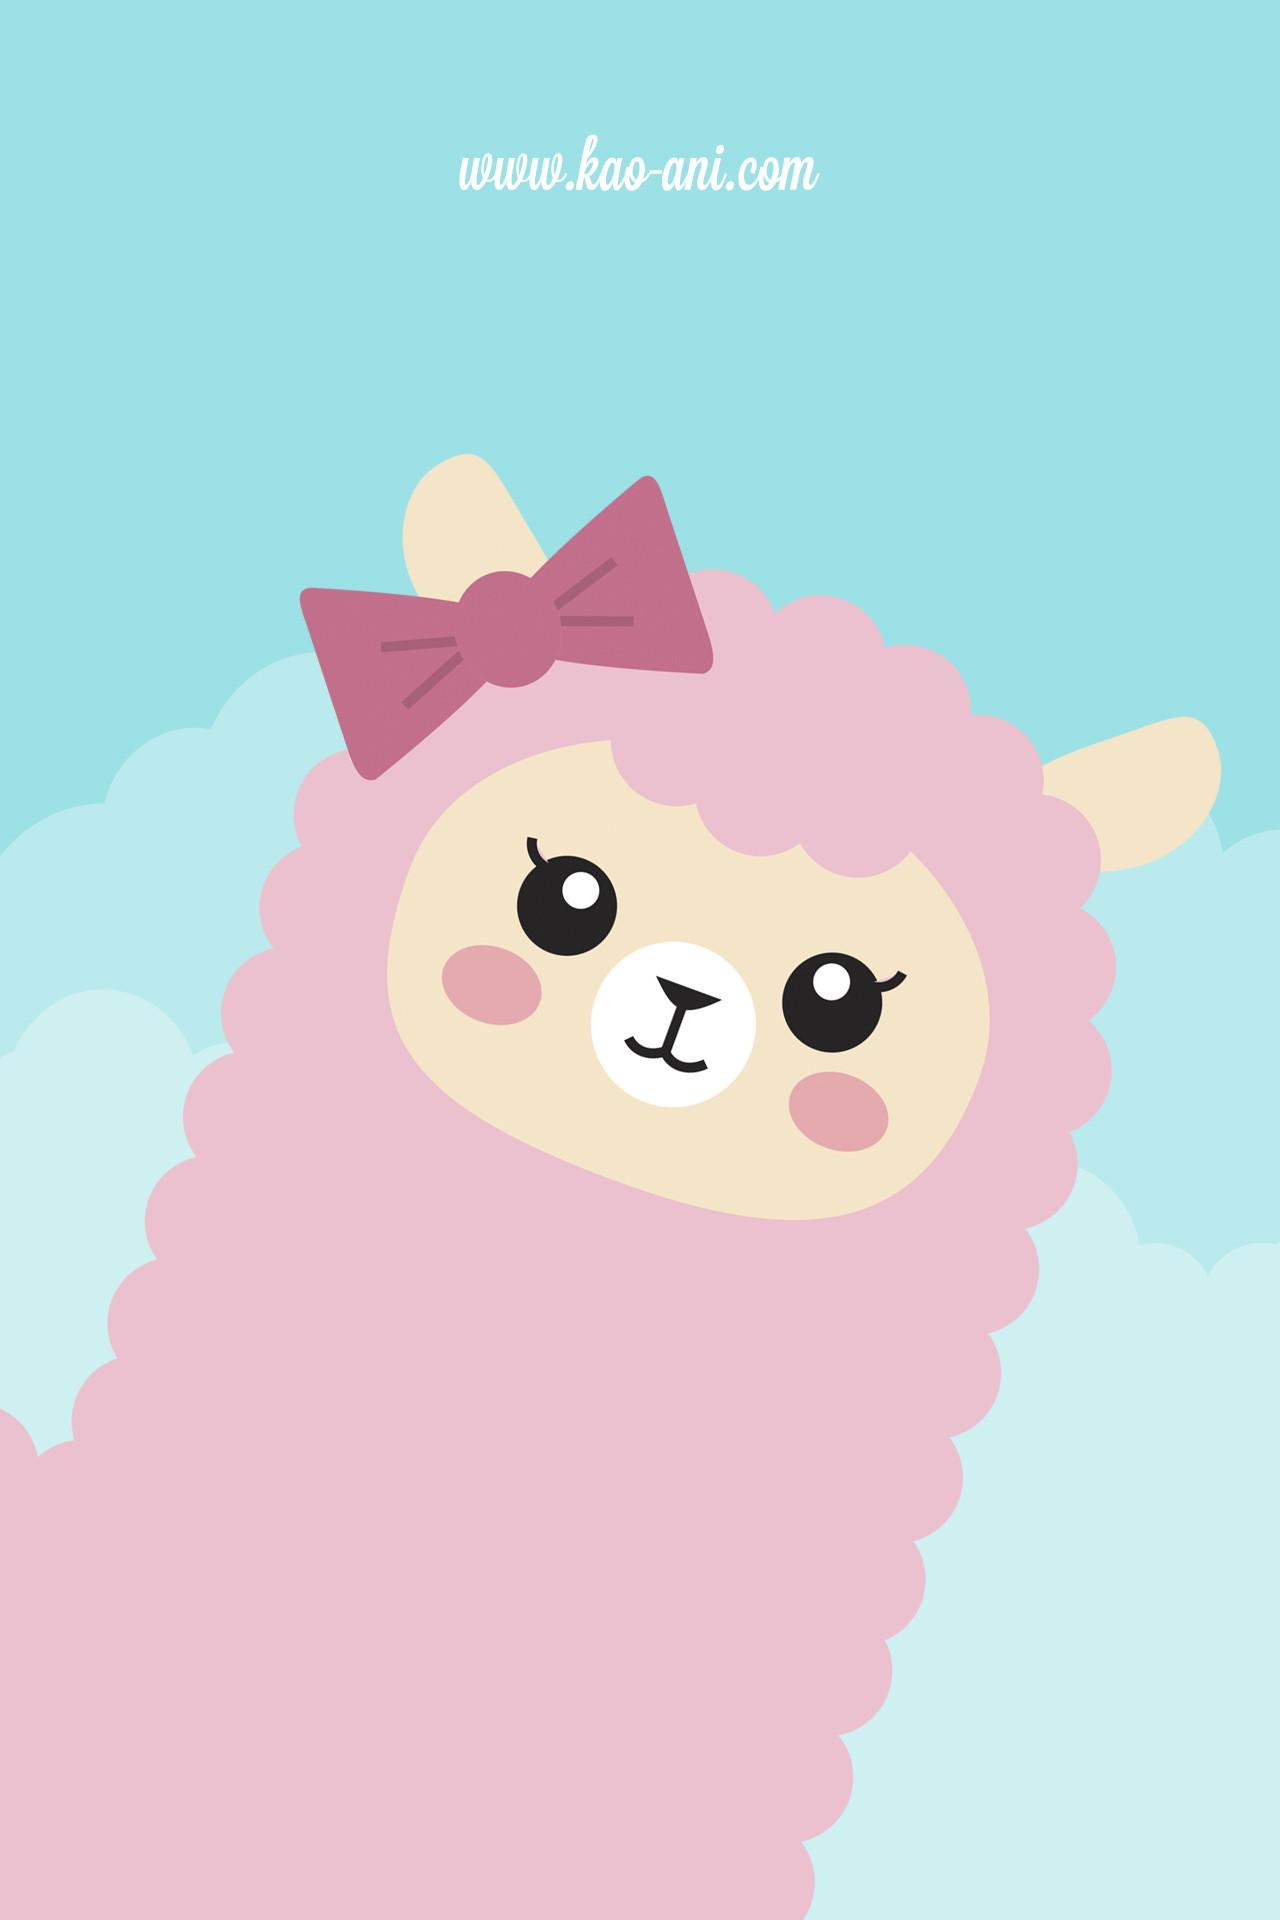 Iphone Backgrounds Tumblr Cute Alpaca iphone wallpaper